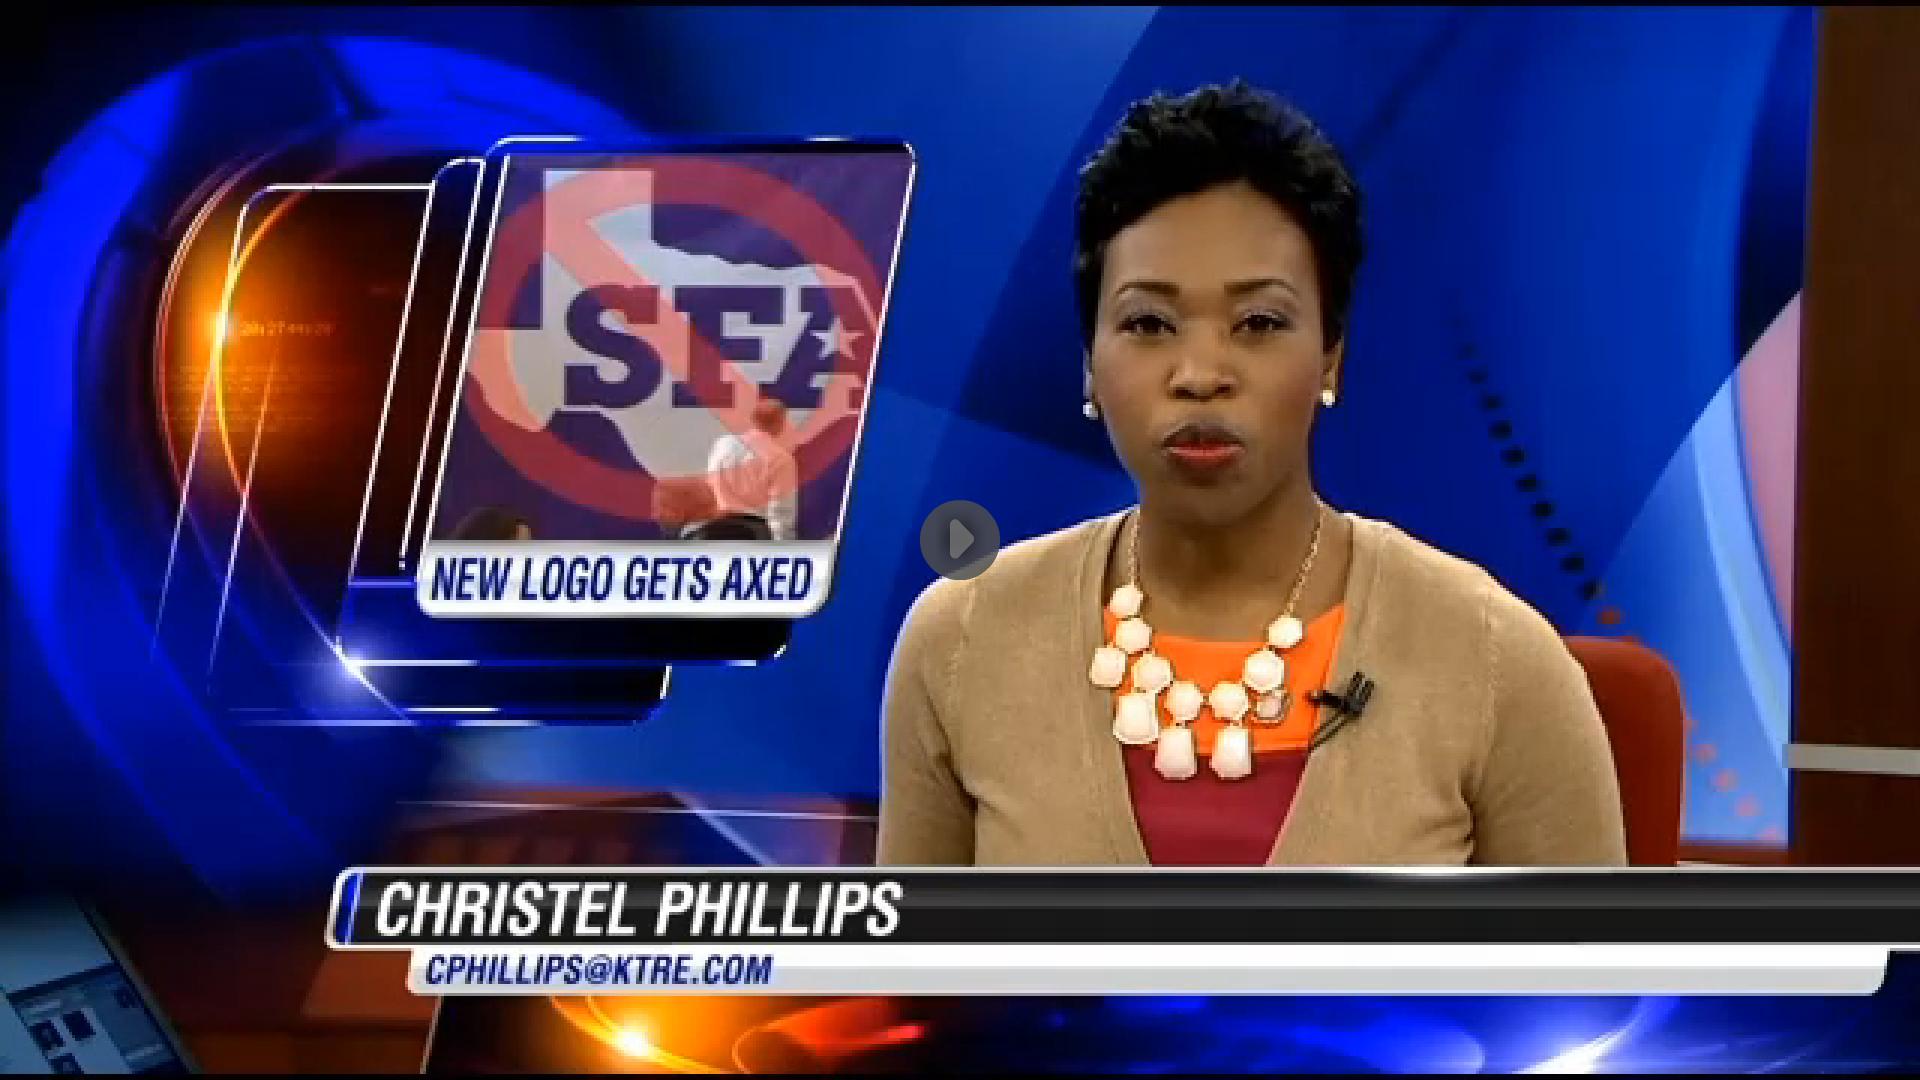 SFA logo gets axed